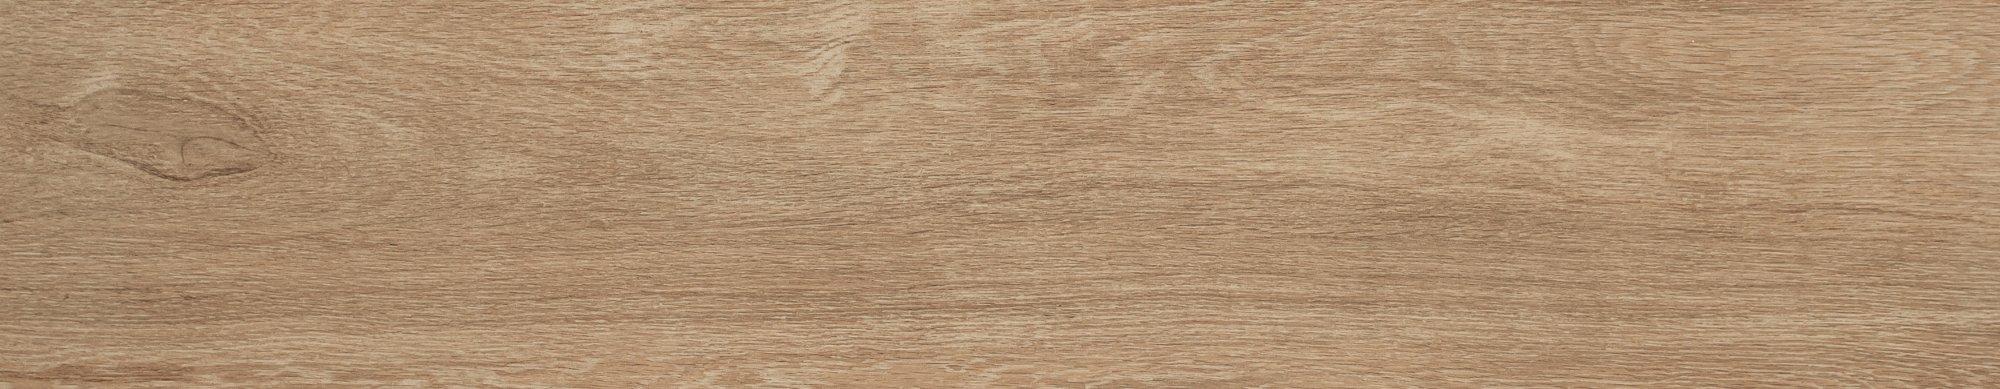 Catalea honey - dlaždice 17,5x90 béžová